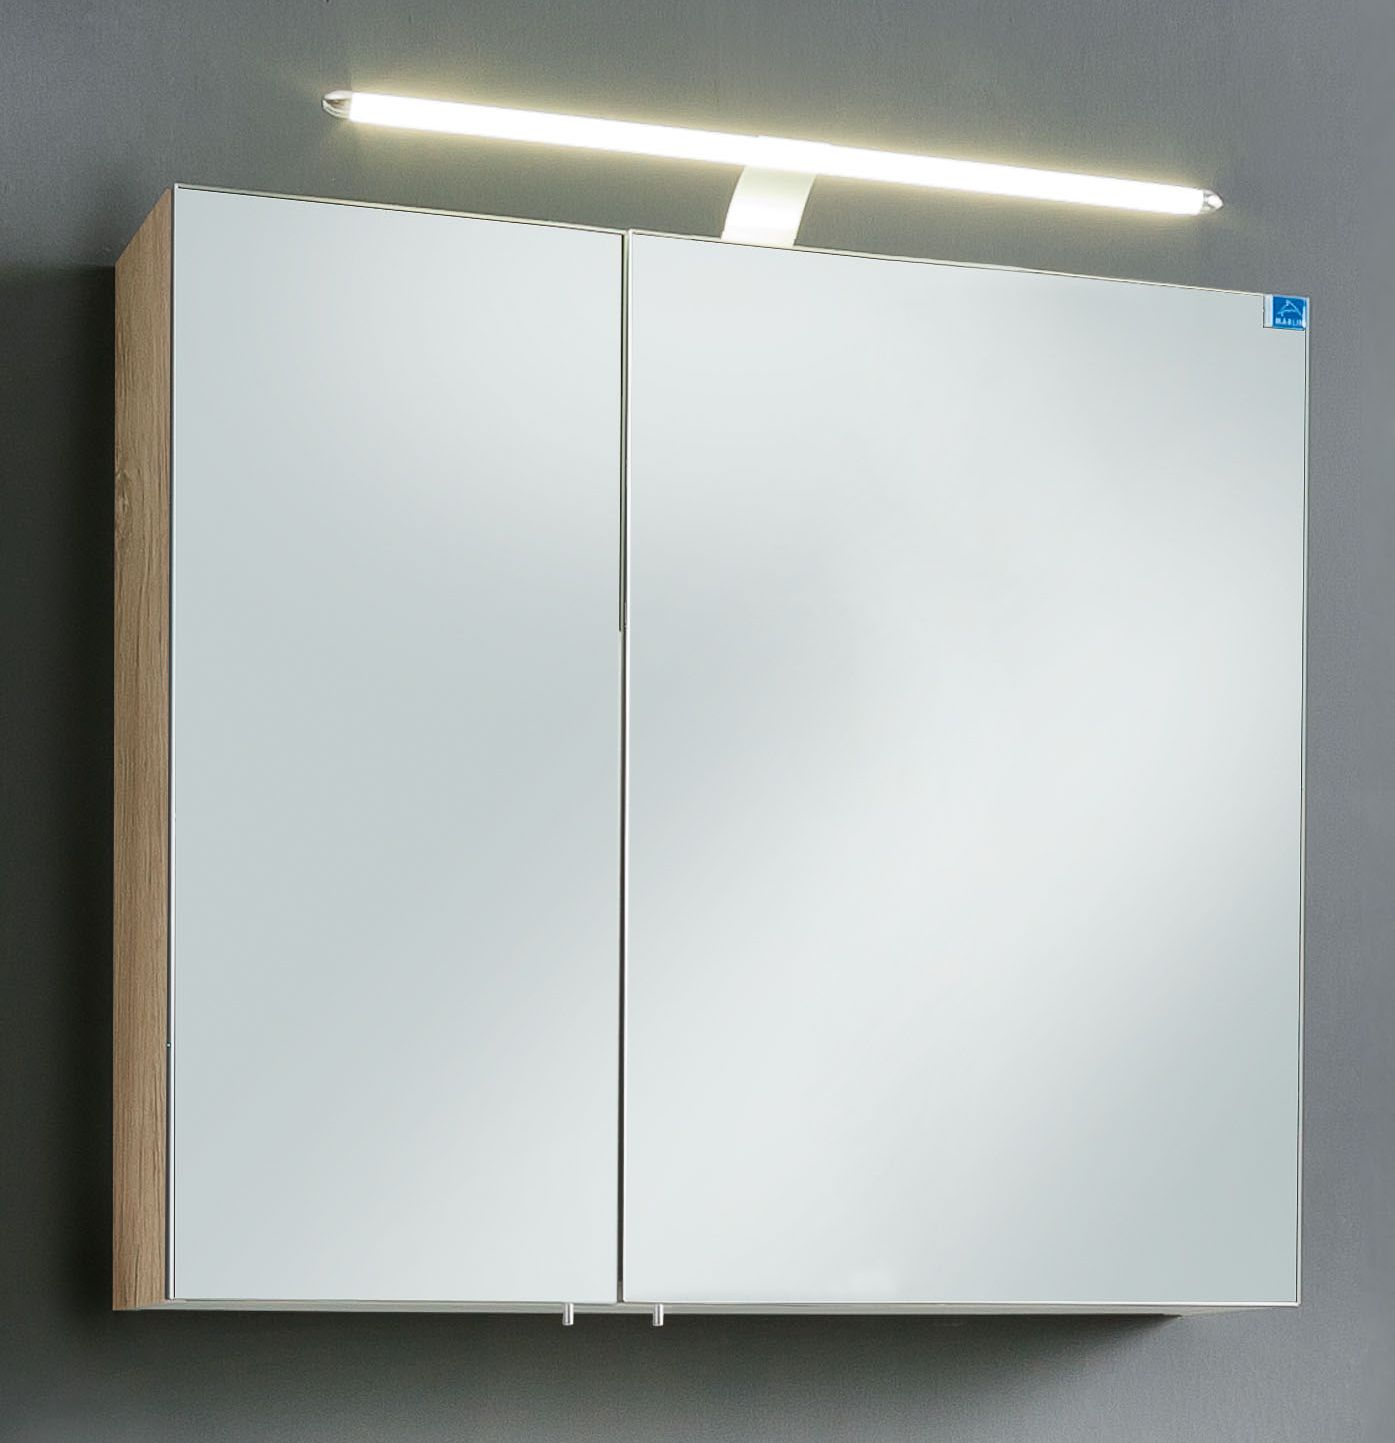 marlin bad 3030 christall spiegelschrank 80 cm stoa8s g nstig kaufen m bel universum. Black Bedroom Furniture Sets. Home Design Ideas